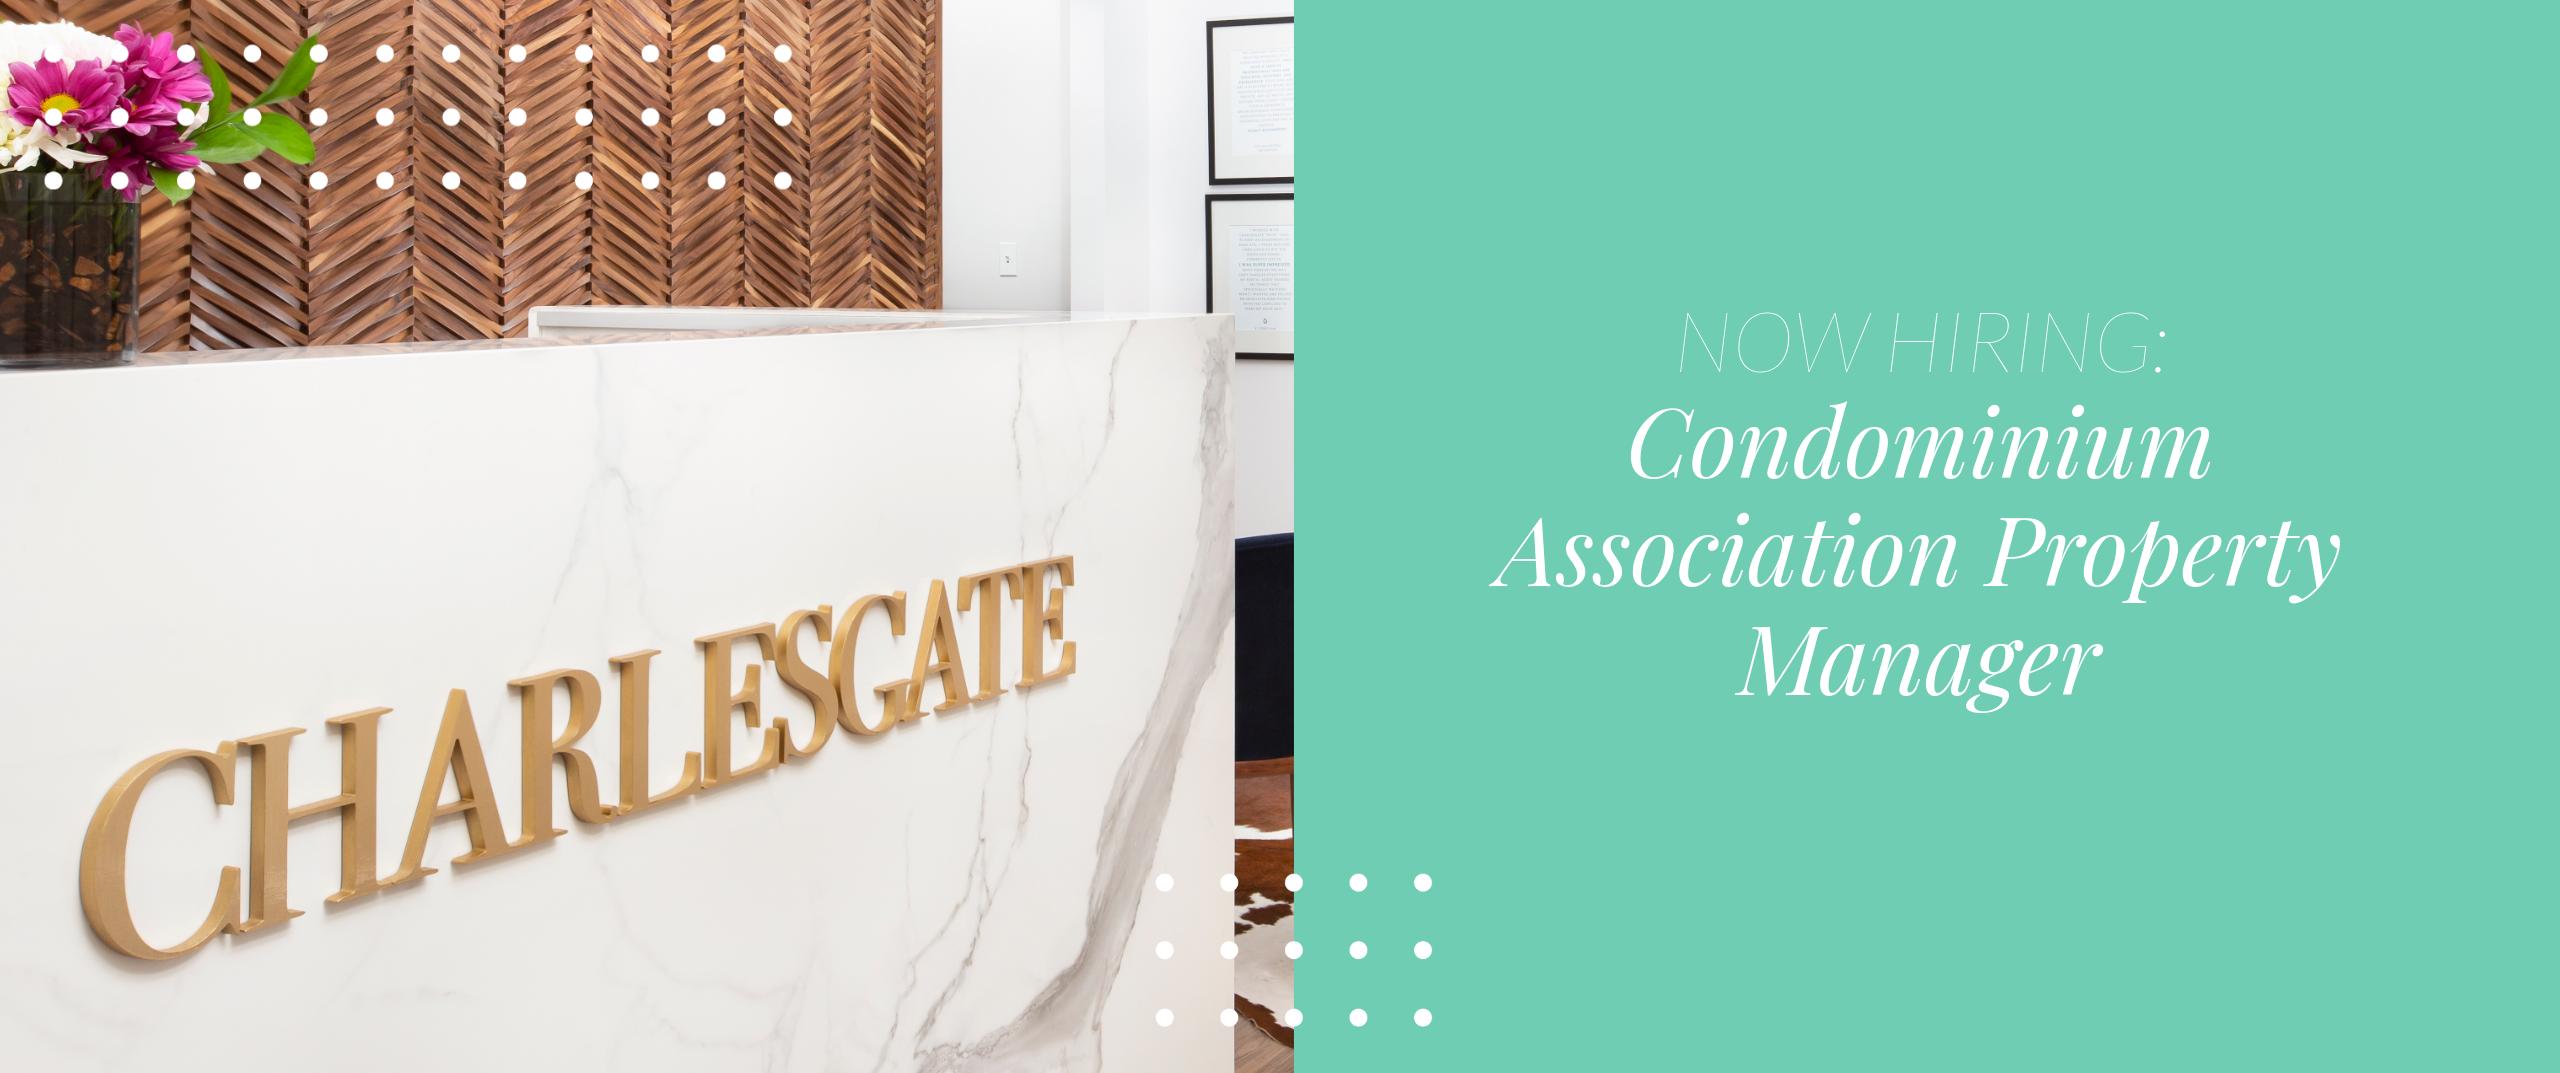 Now Hiring! Seeking a Property Manager - Condominium Association